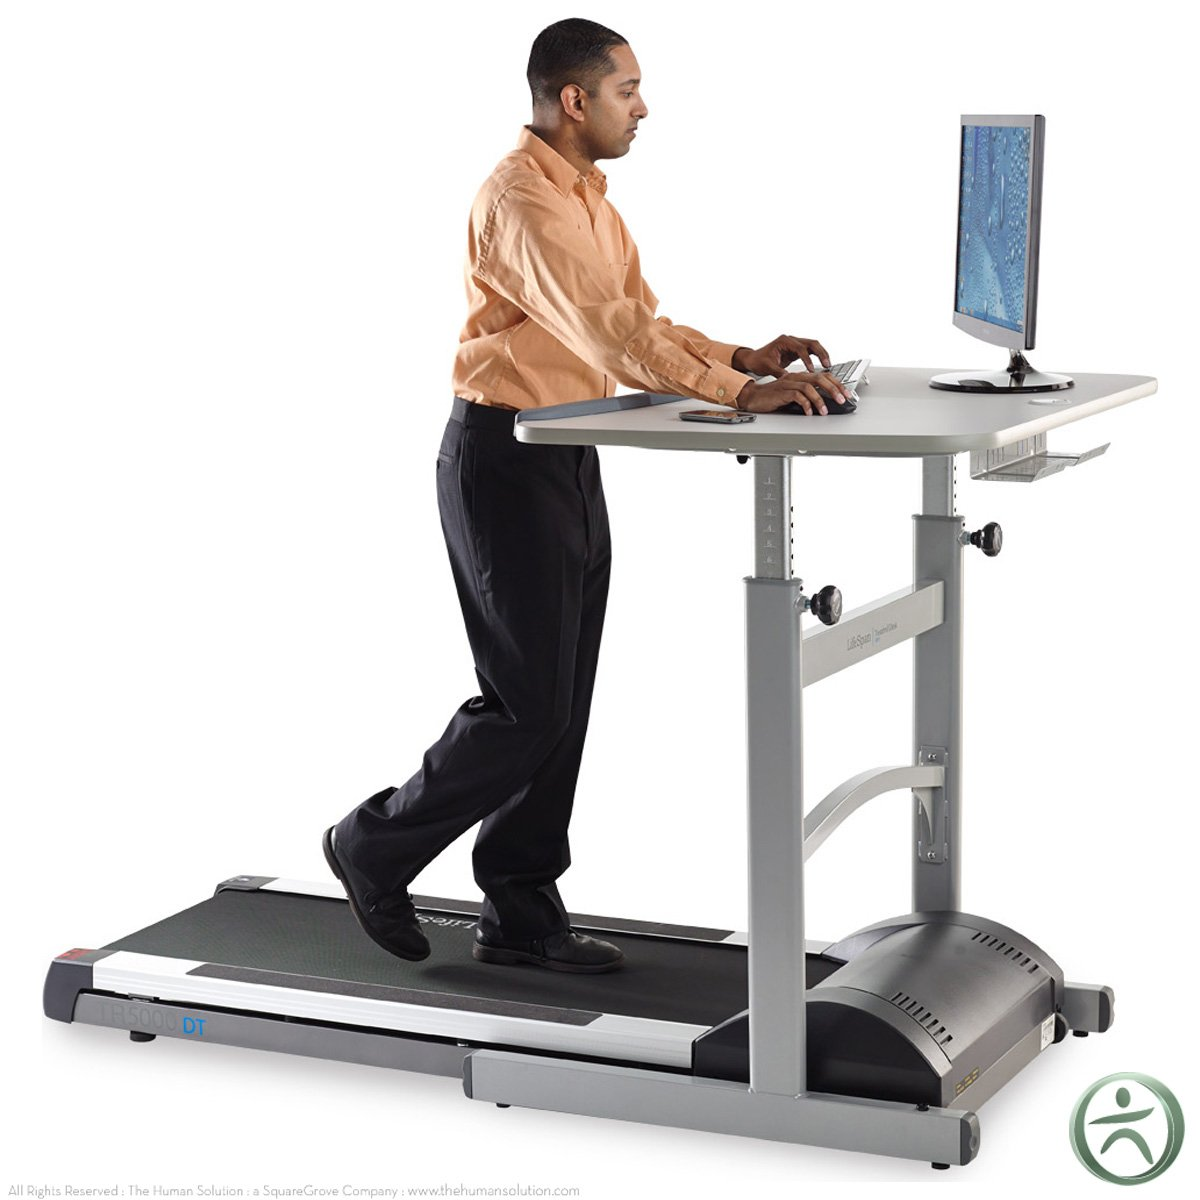 desk s treadmill customer best under reviews lifespan guide buyer